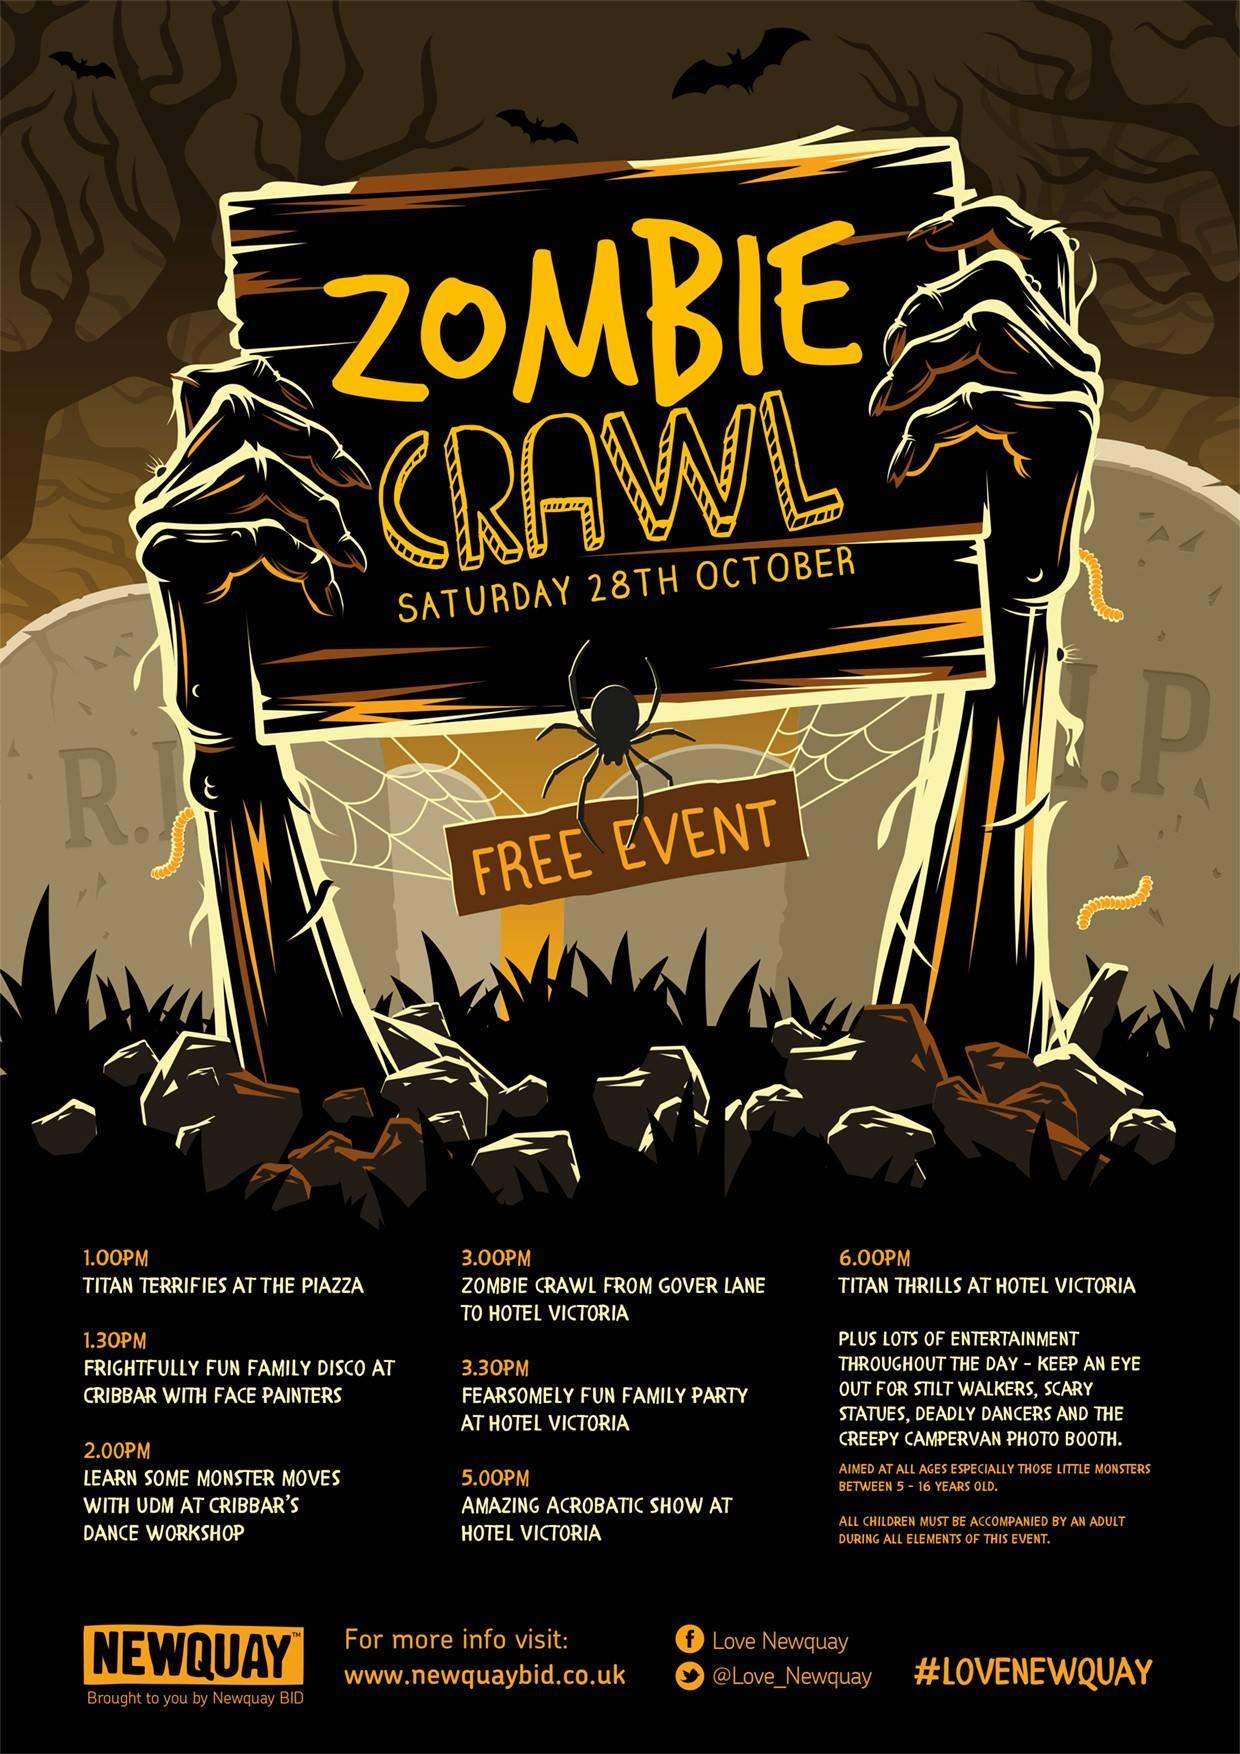 zombie crawl Newquay - 28th October 2017